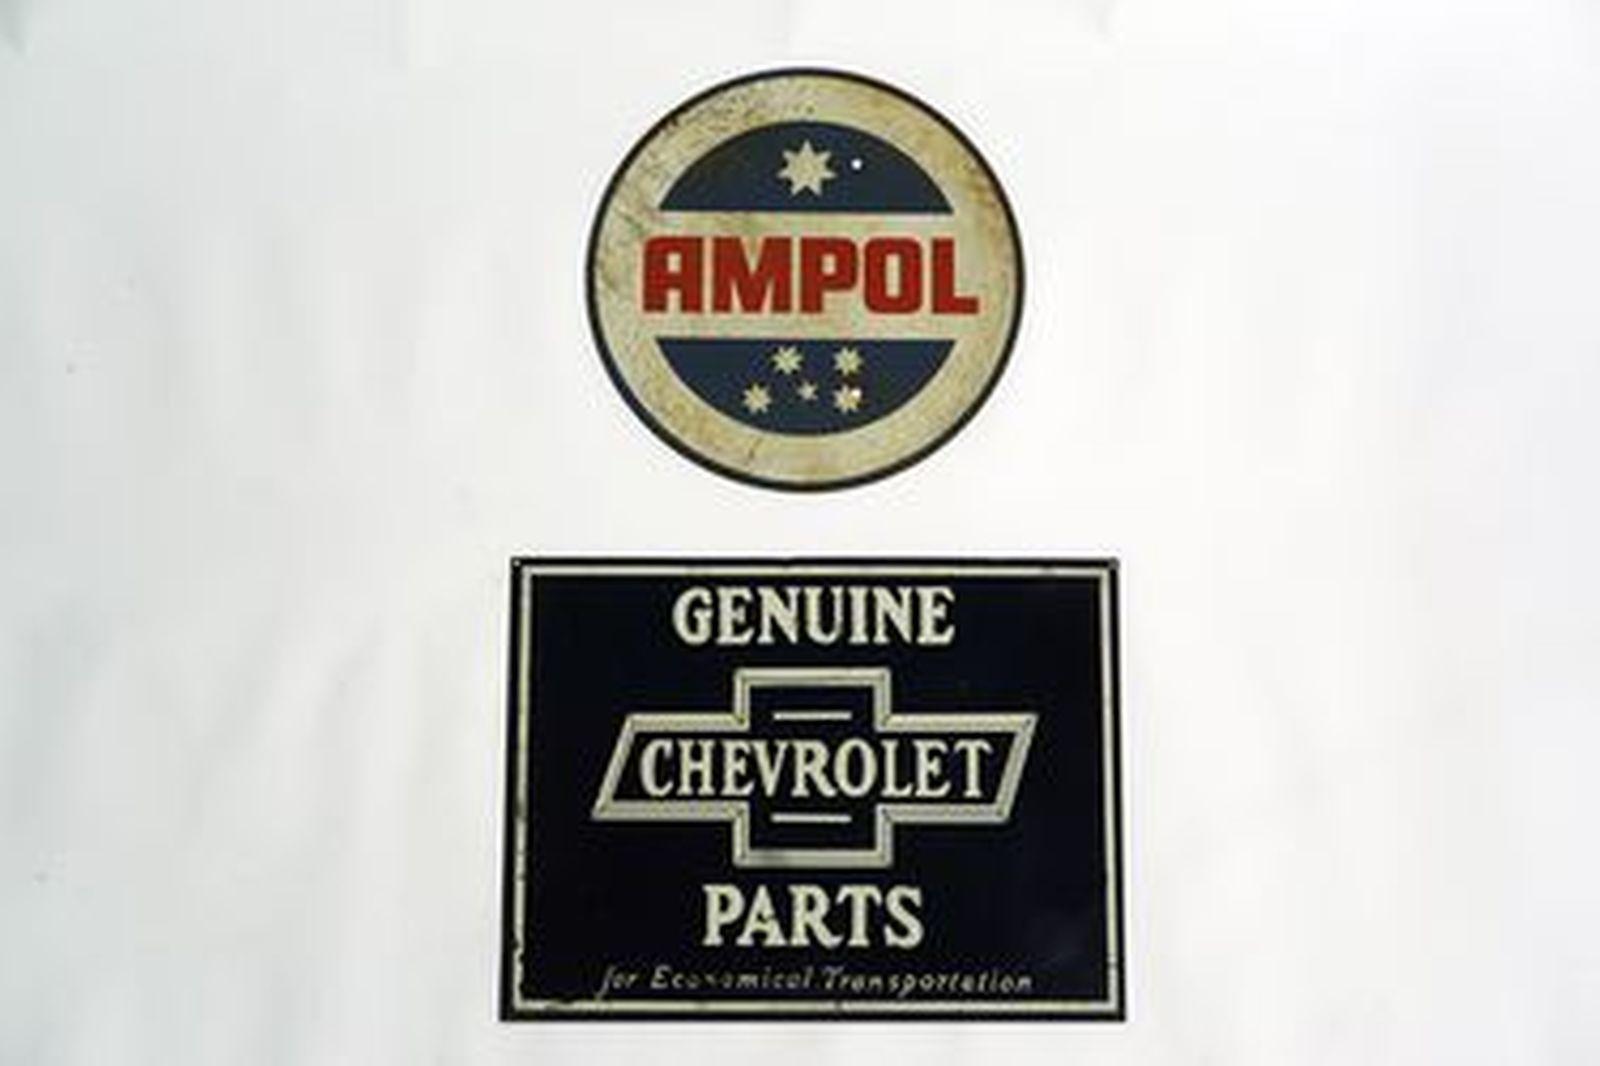 Tin Signs x 2 - Chevrolet 'Bowtie' Rectangular (45 x 60cm) & Ampol Round (44cm diameter)